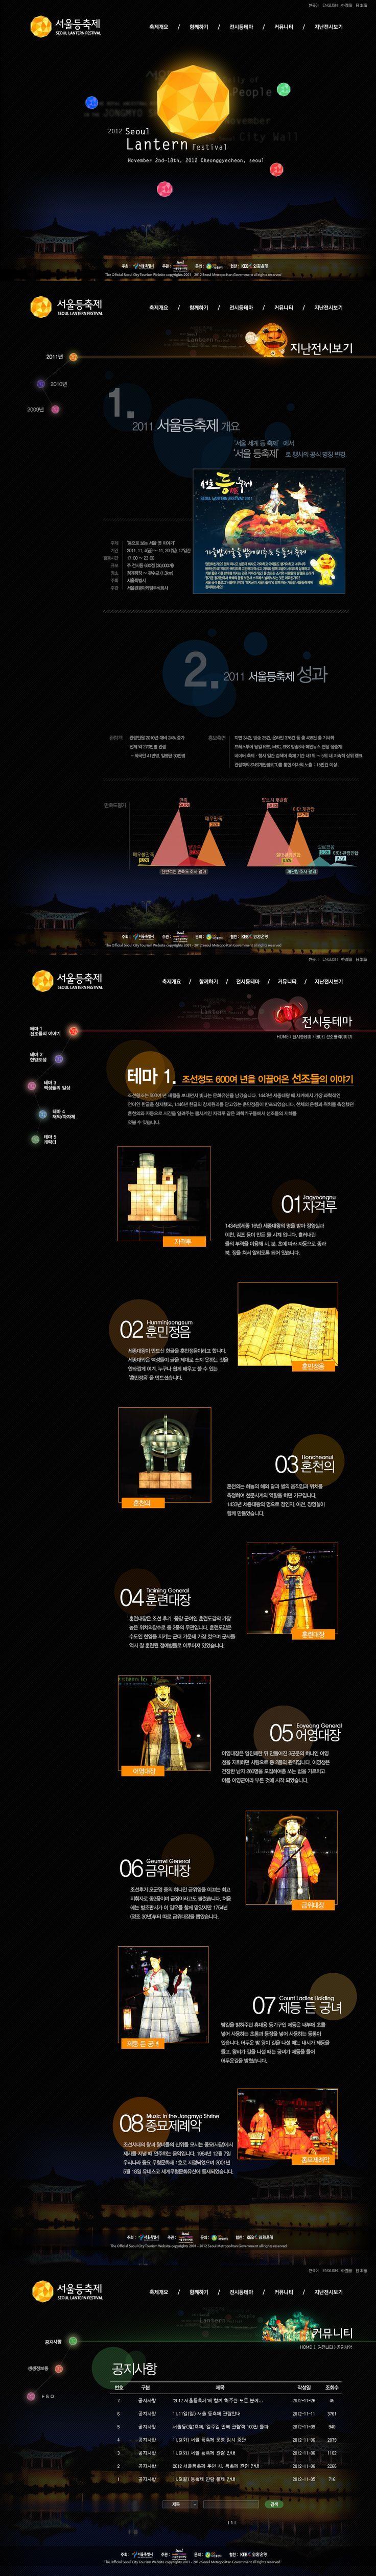 2012 Seoul Lantern Festival Website /  2012 서울 등불축제 웹사이트 시안